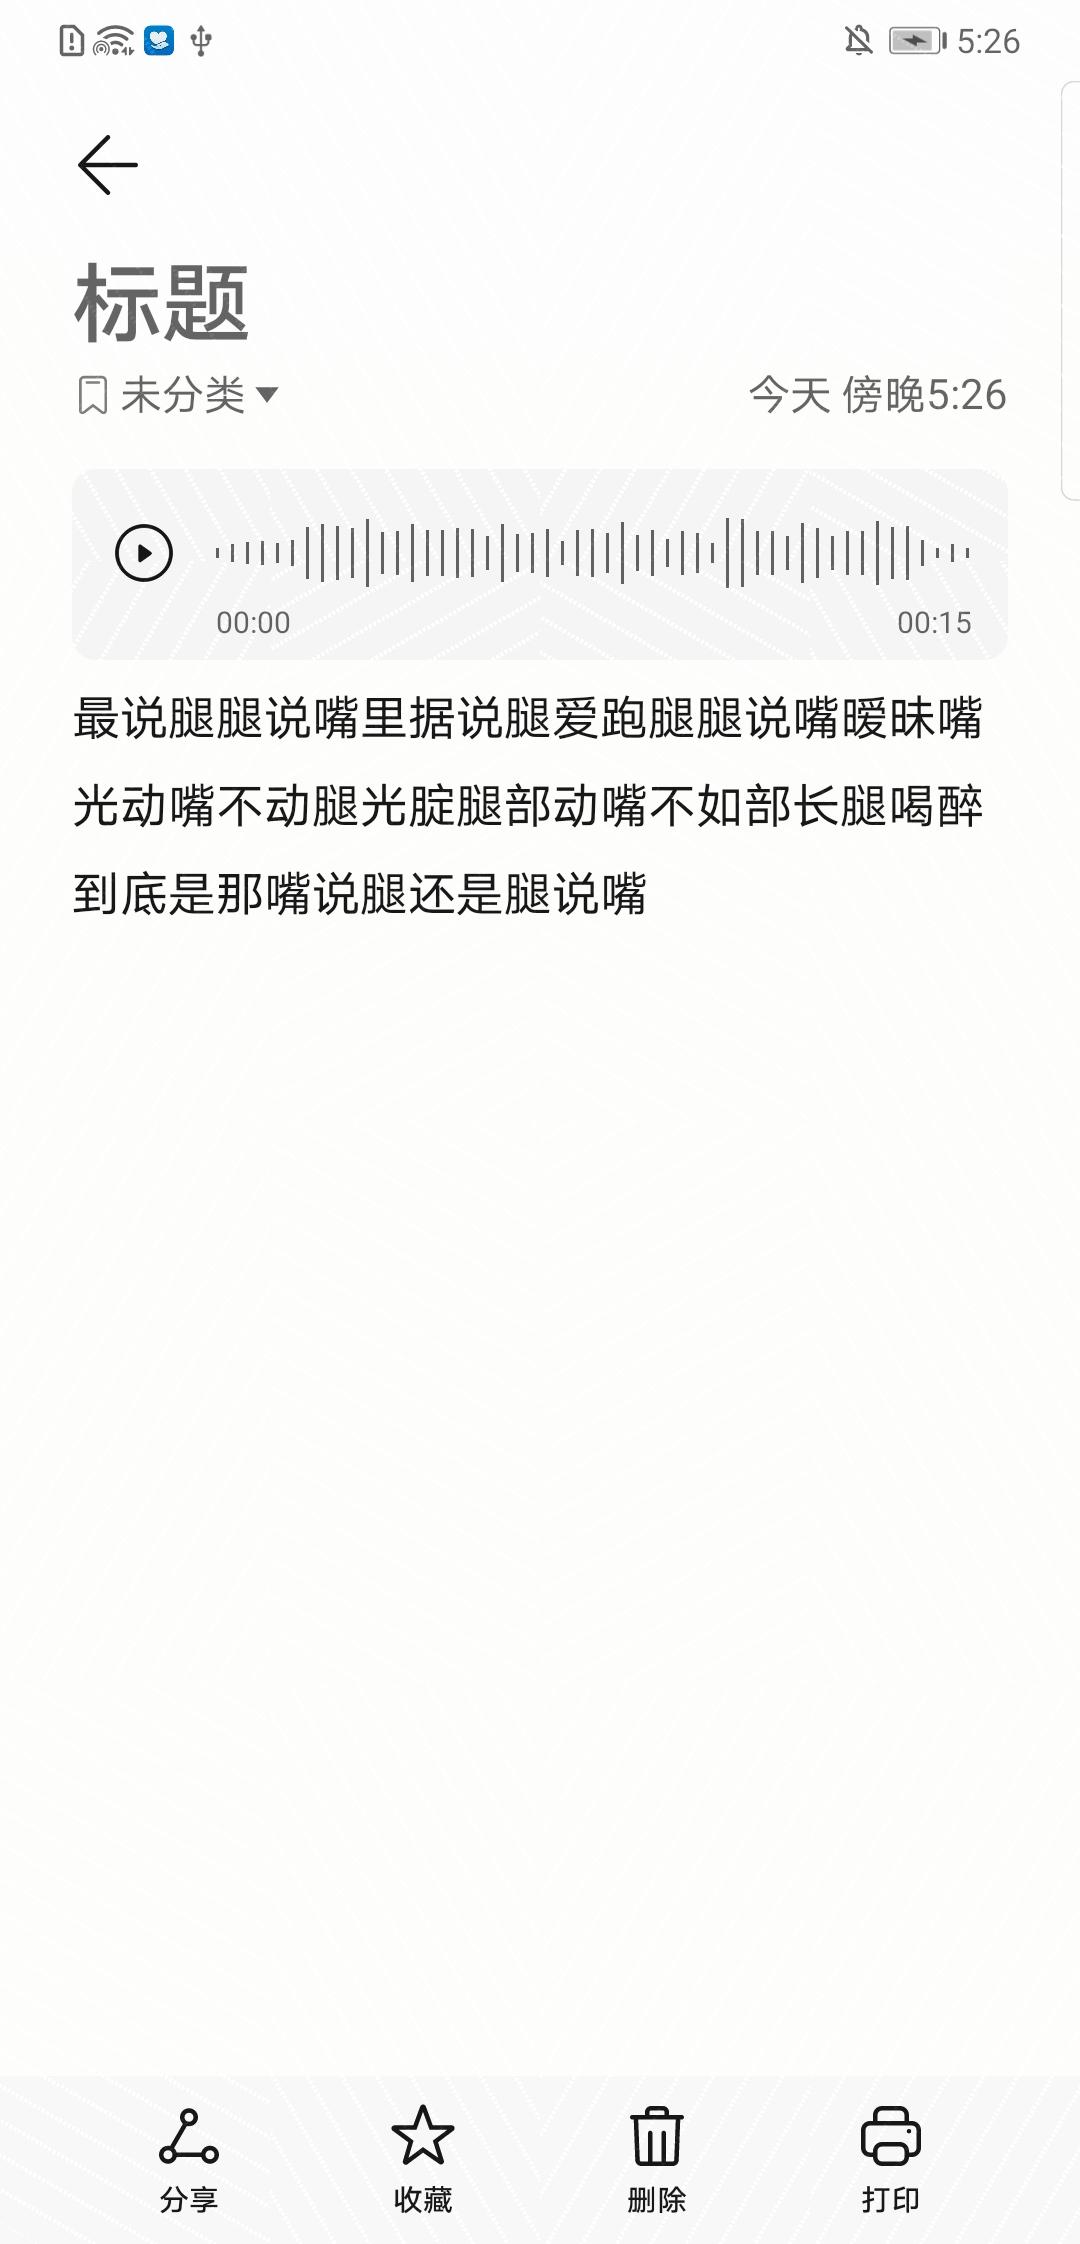 Screenshot_20190820_172613_com.example.android.notepad.jpg